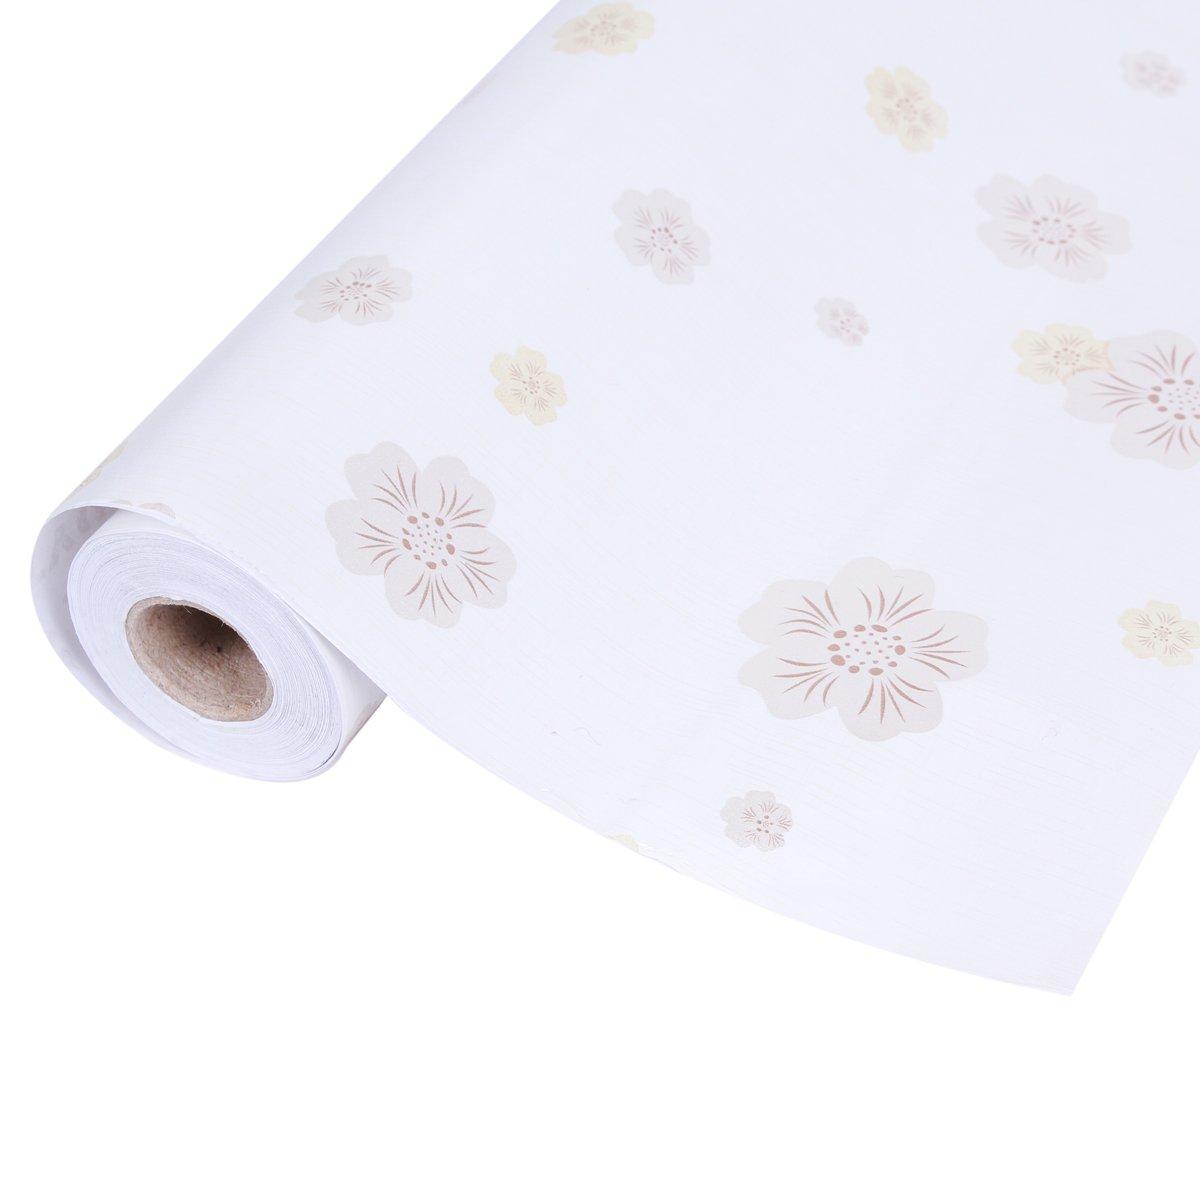 Damara Elegance Floral Art Removable Stick Wallpaper Width 175 1200x1200